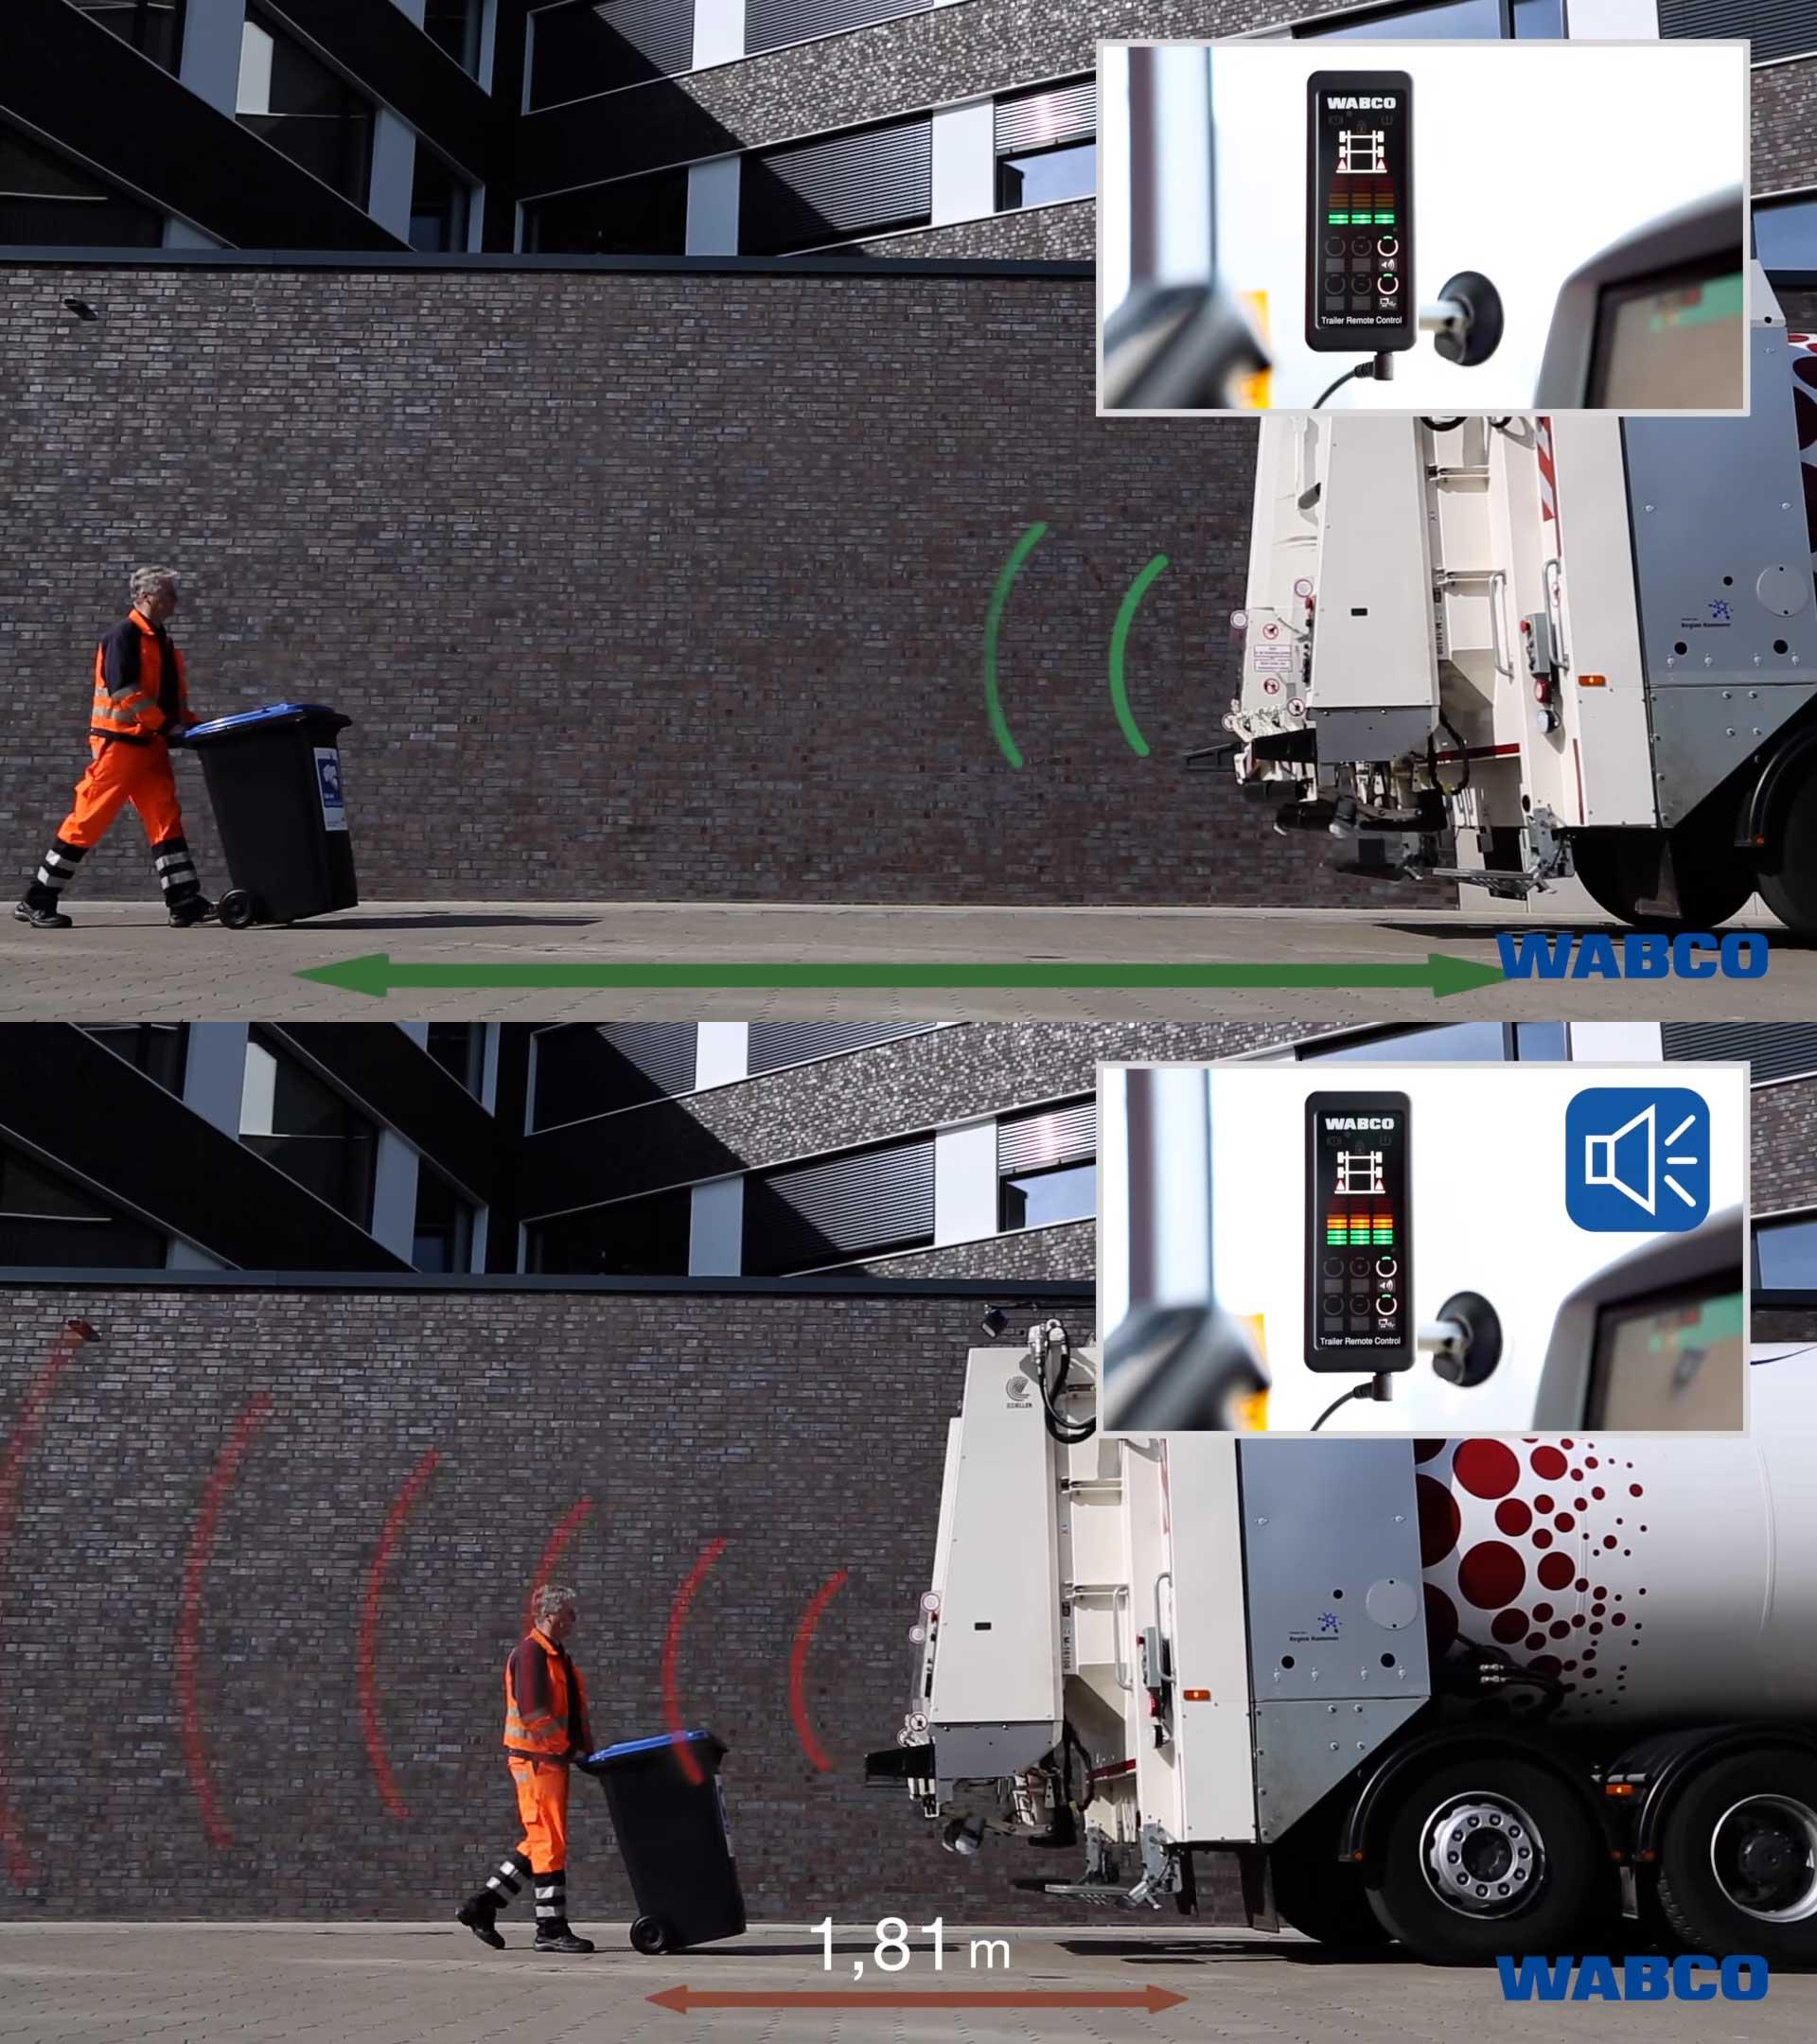 Wabco TailGUARD: Rear blind spot detection system